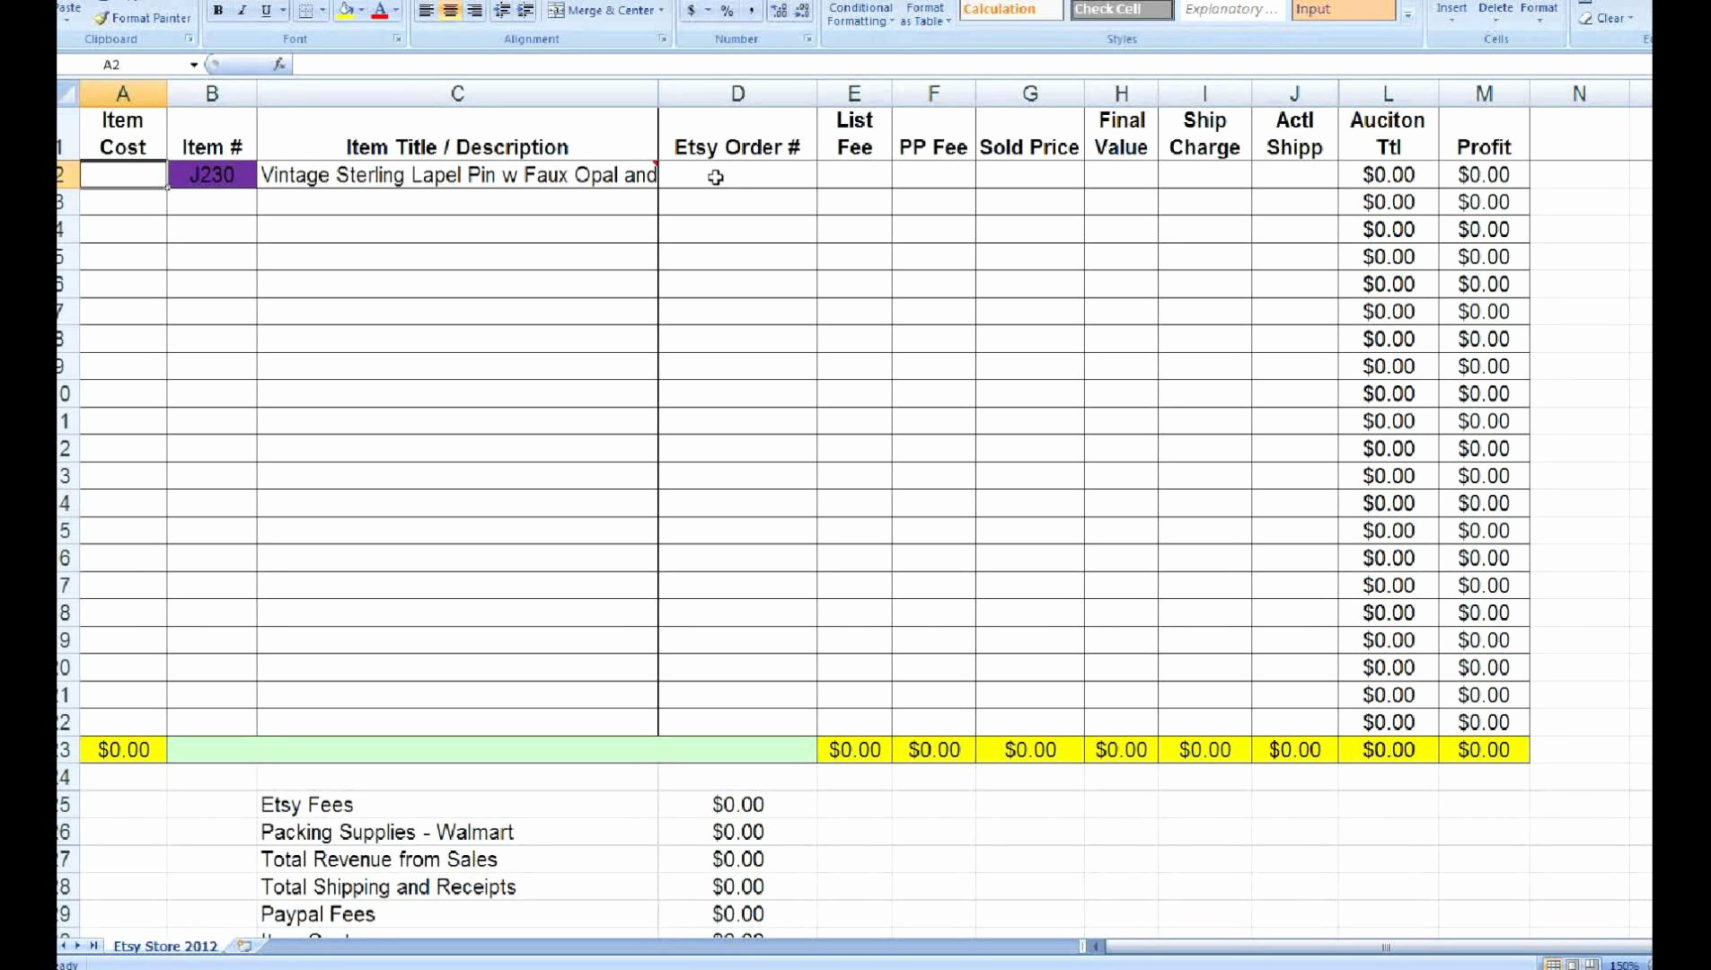 Grocery Spreadsheet Regarding Grocery Spreadsheet For Price List Template Printable  Ebnefsi.eu